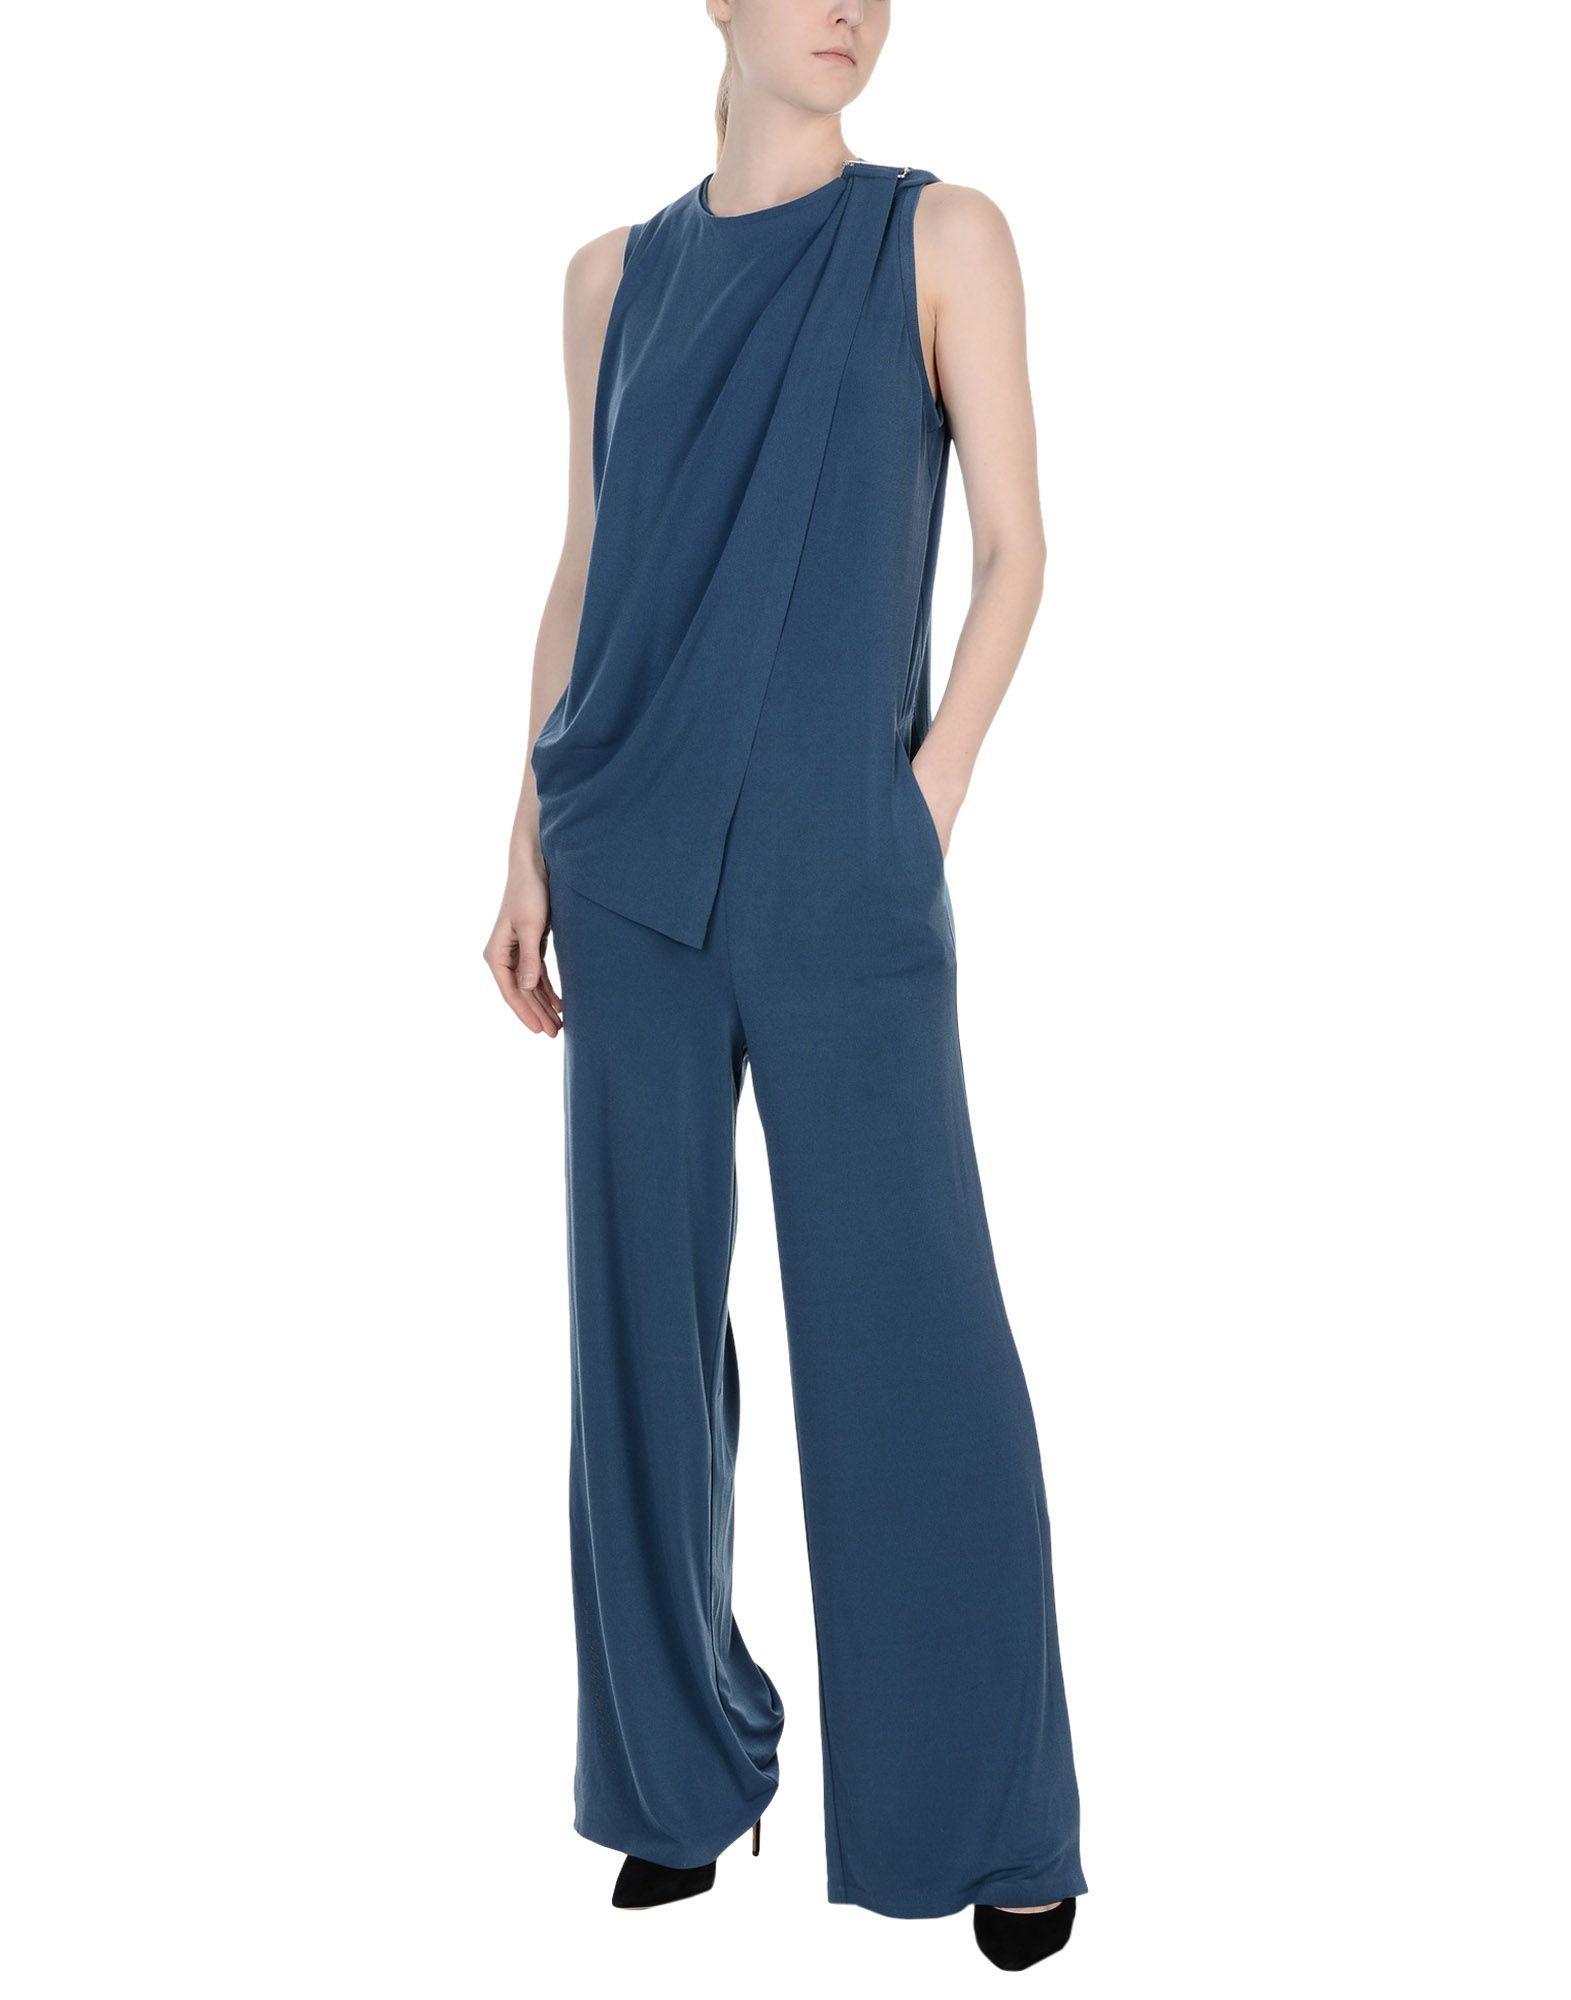 By Malene Birger Slate Blue Sleeveless Jumpsuit